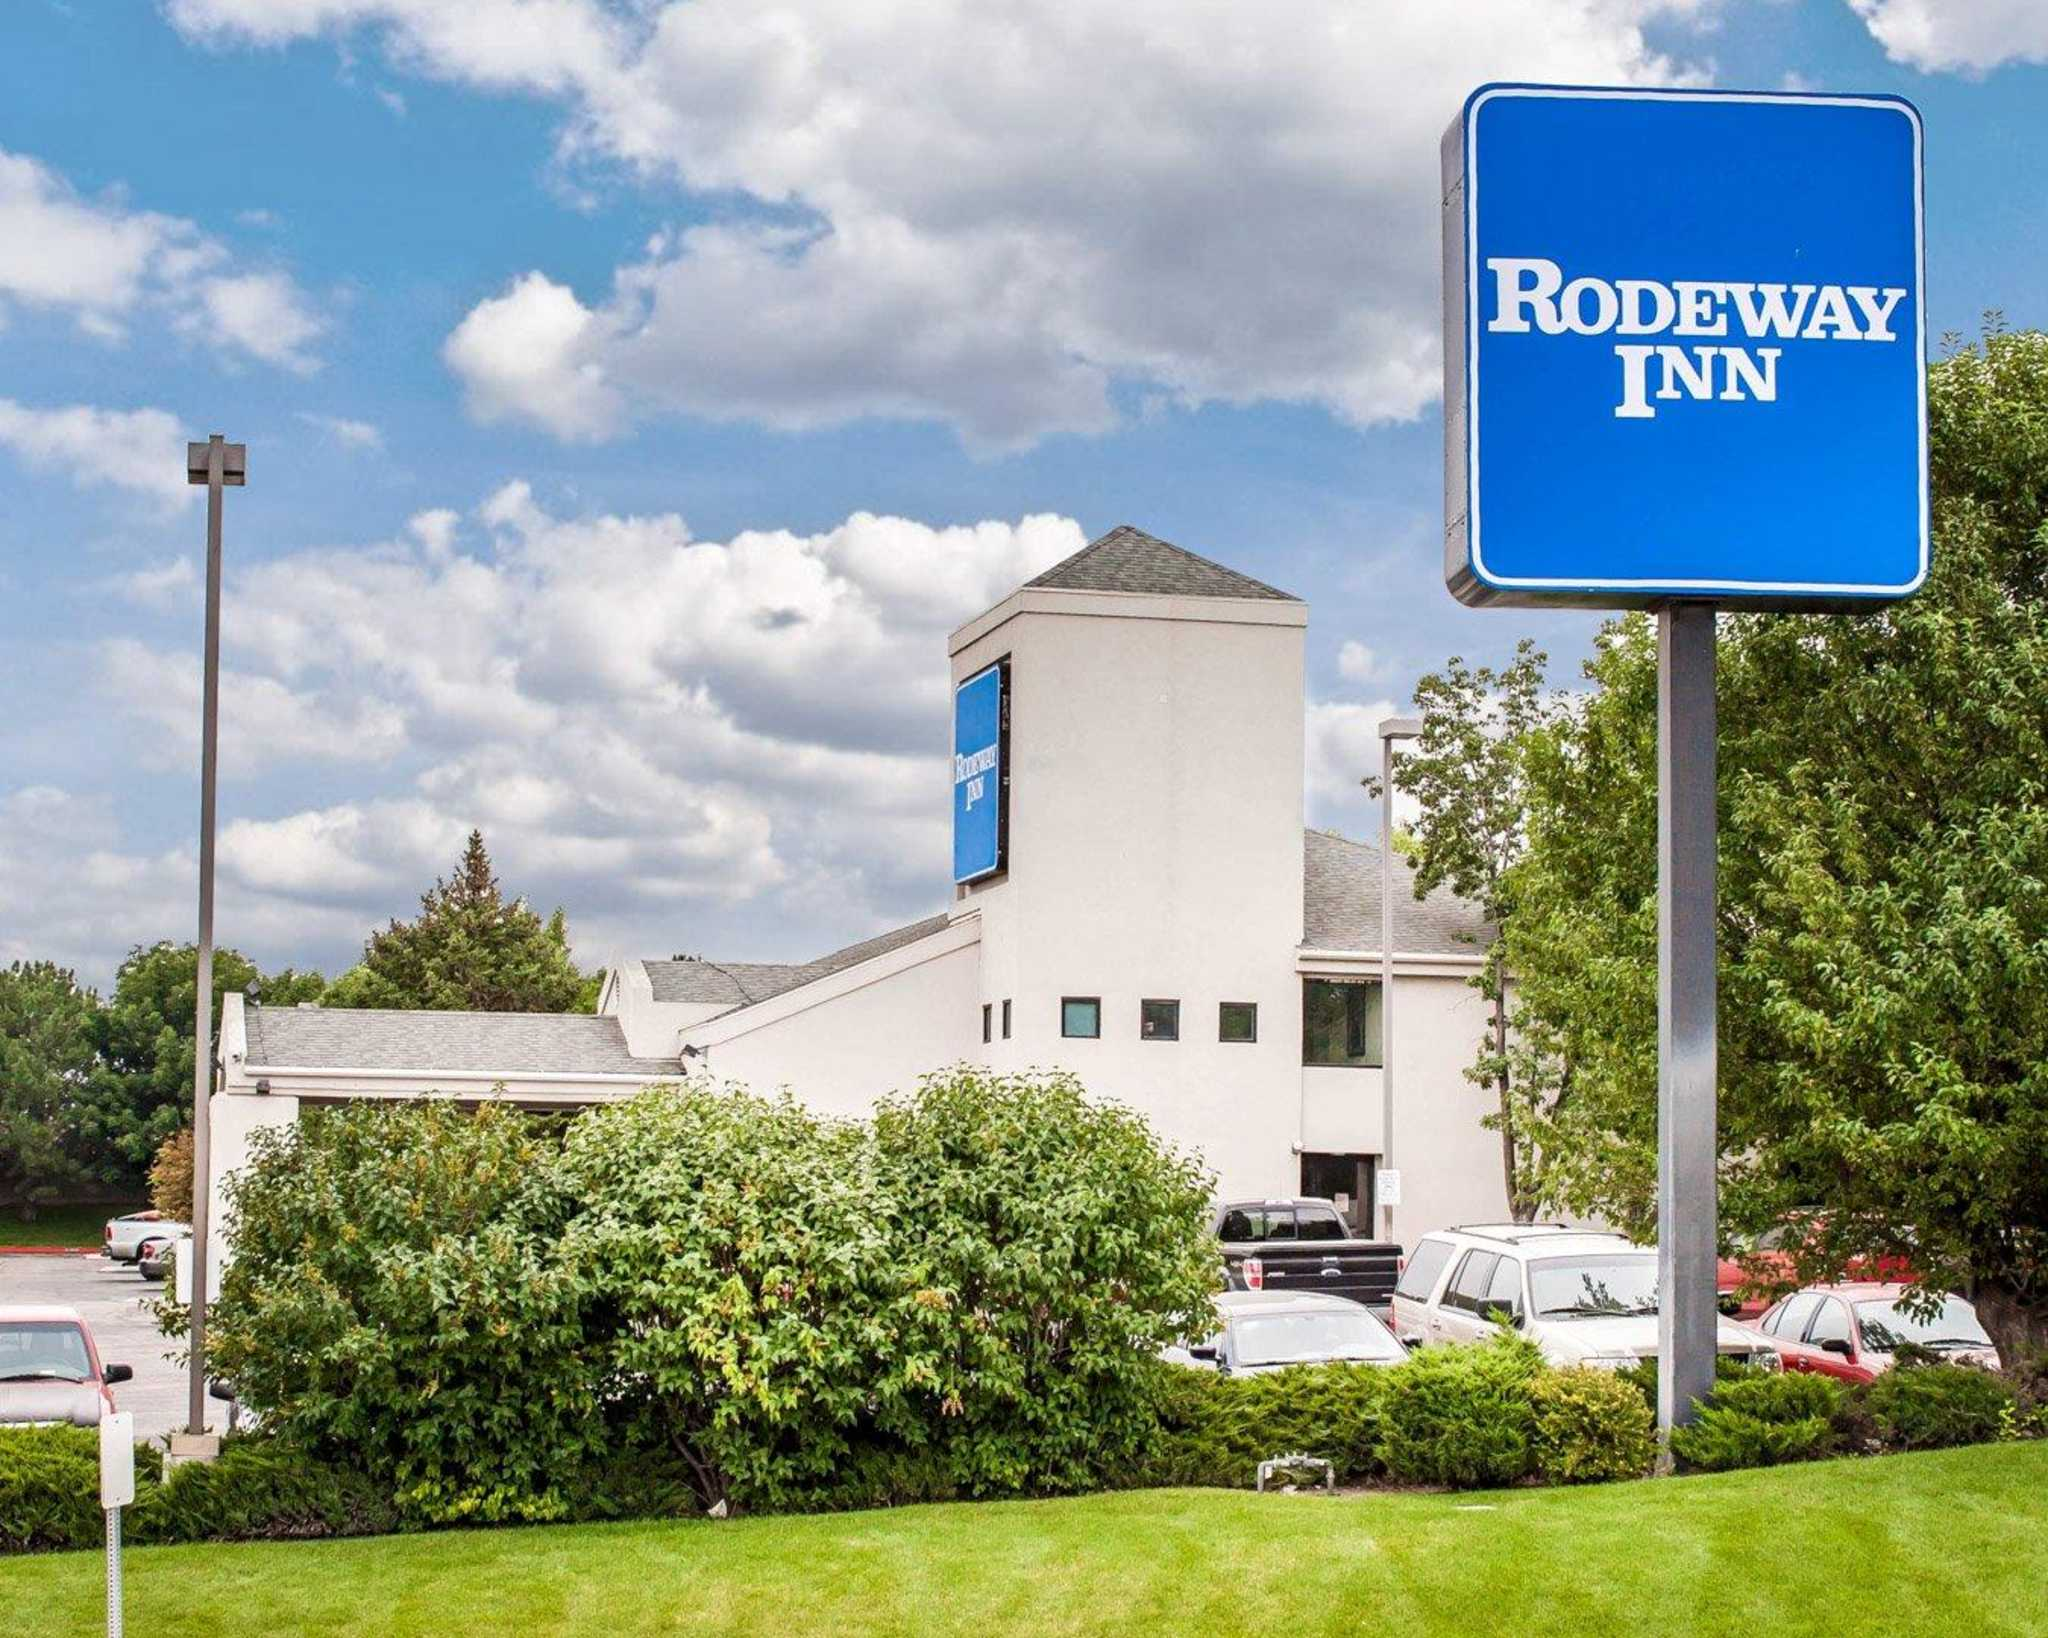 Rodeway Inn Airport image 7